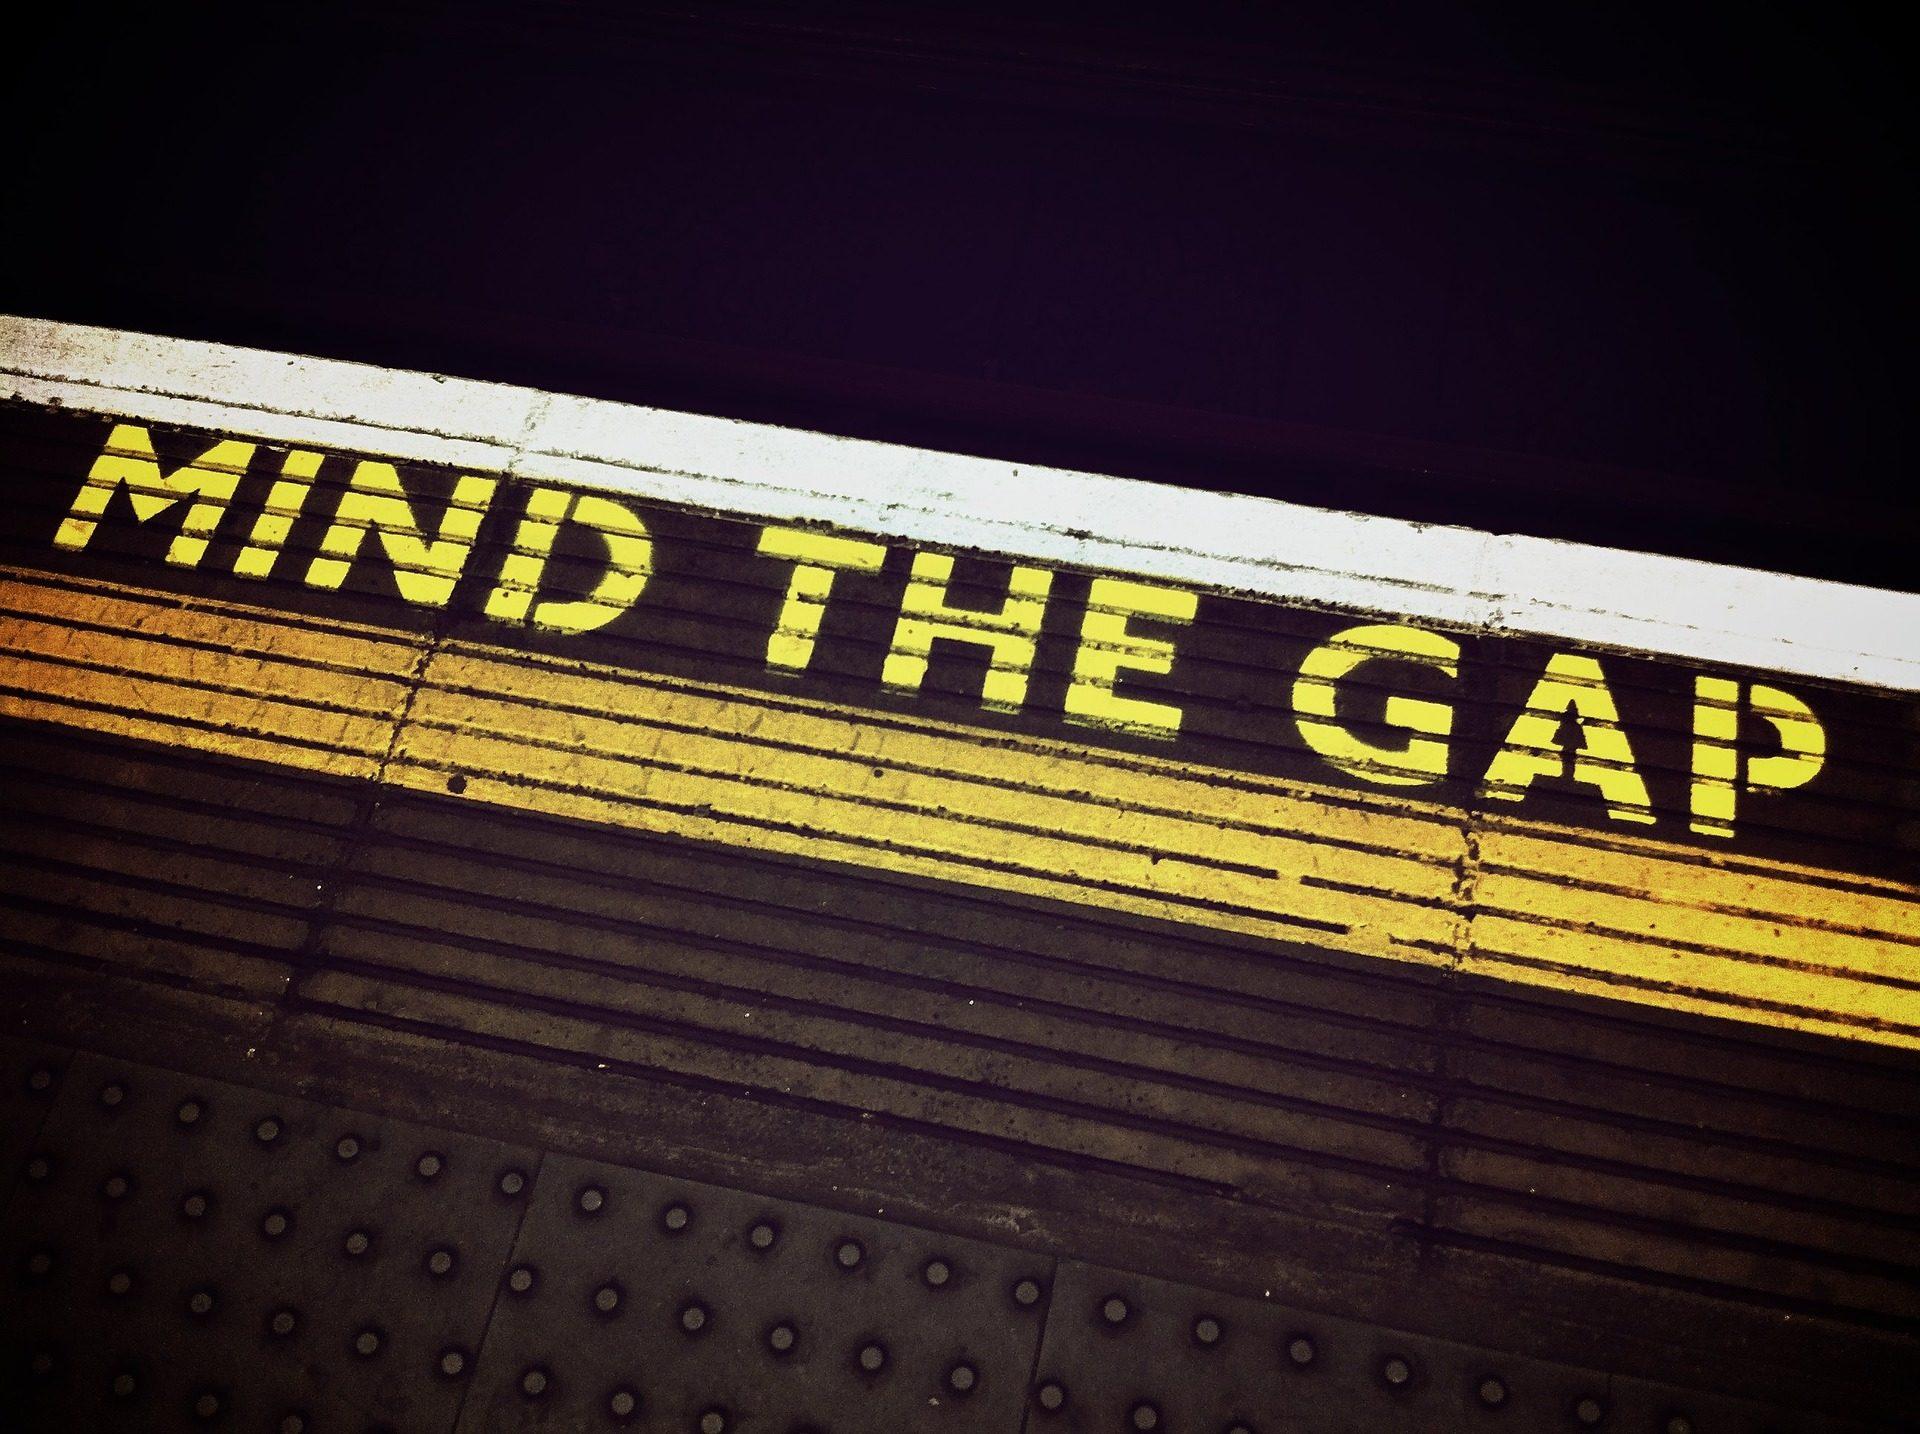 mind-the-gap-1876790_1920-1920x1434.jpg